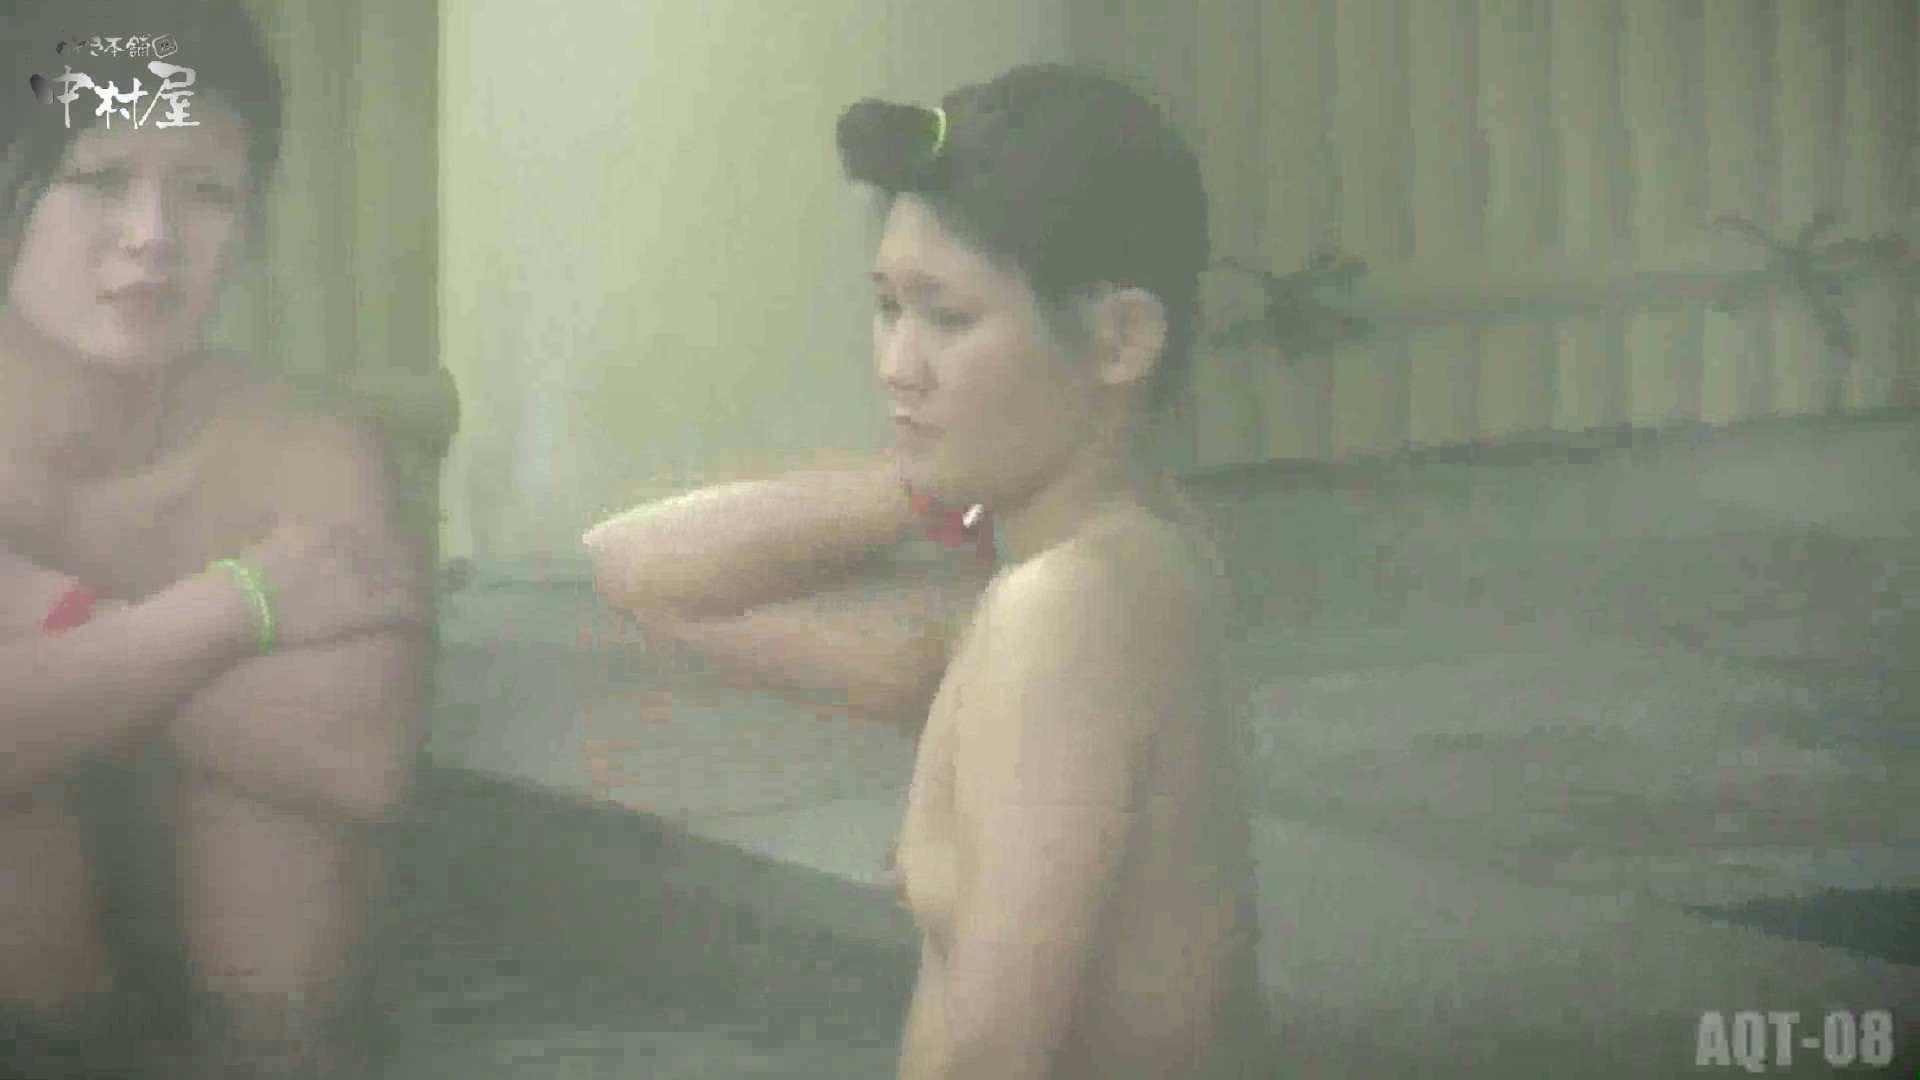 Aquaな露天風呂Vol.872潜入盗撮露天風呂八判湯 其の五 美しいOLの裸体 オメコ動画キャプチャ 85pic 10